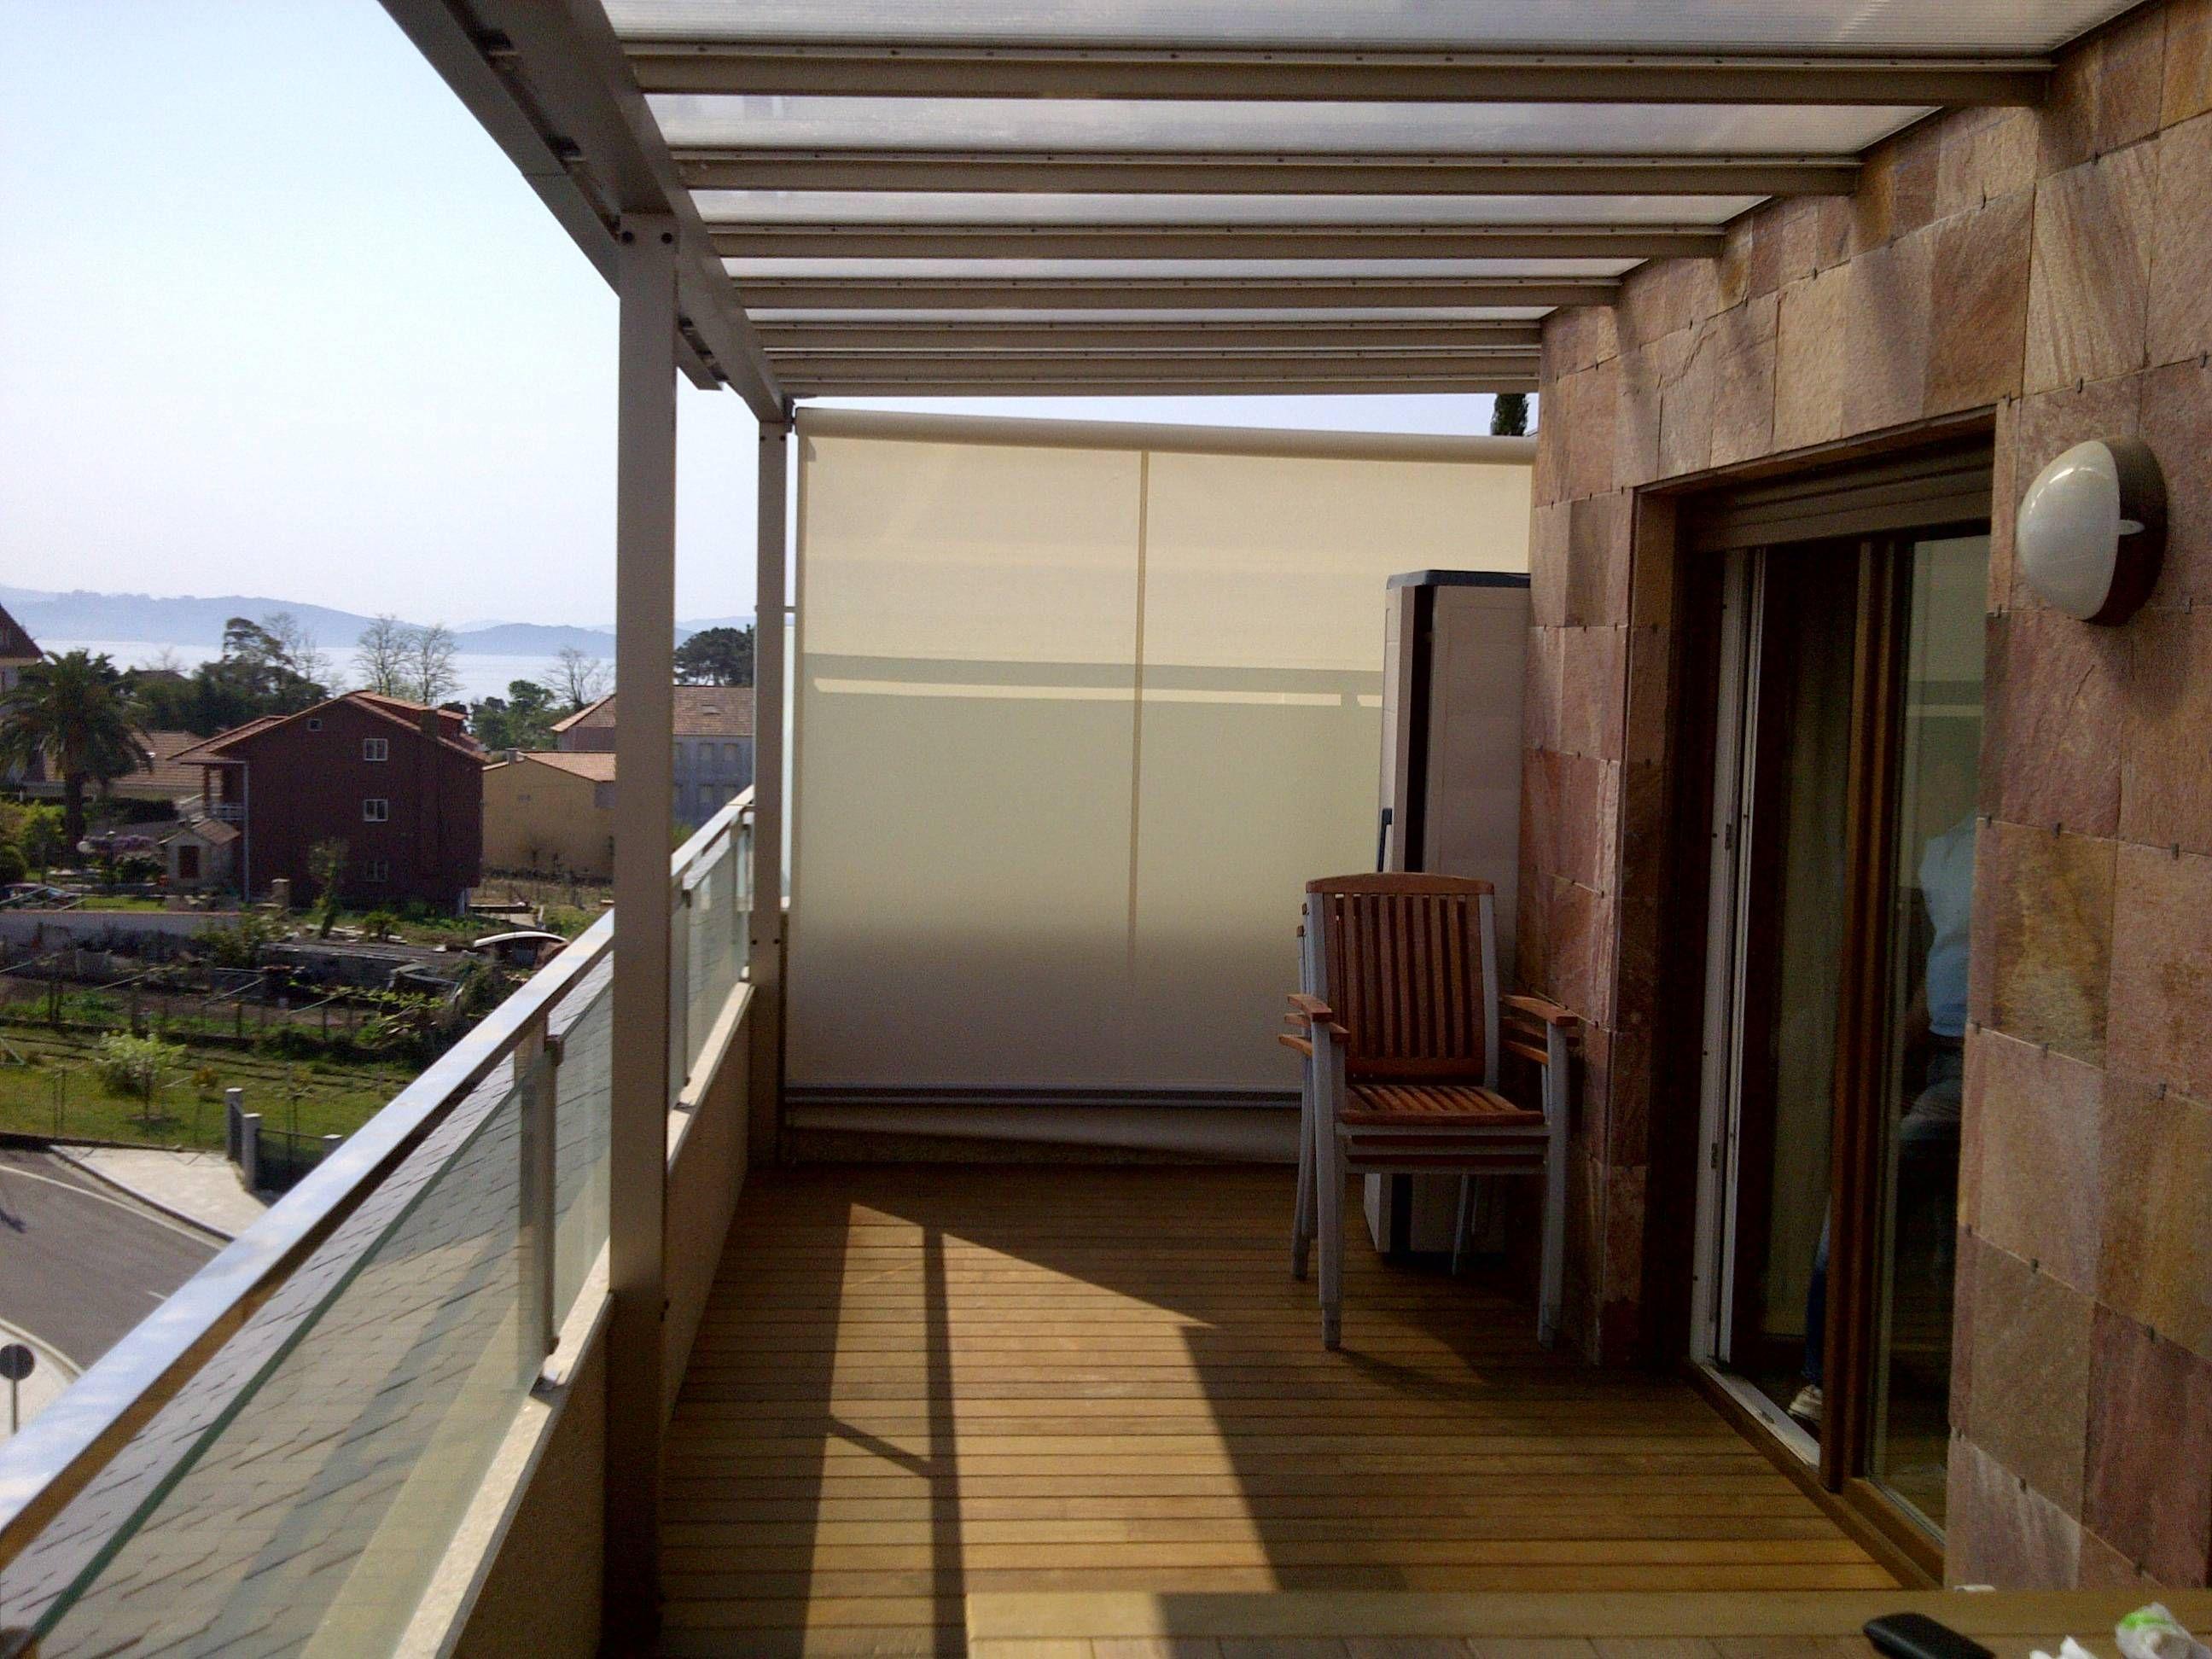 Toldo lateral cortavientos en terraza sistemas de - Proteccion para terrazas ...